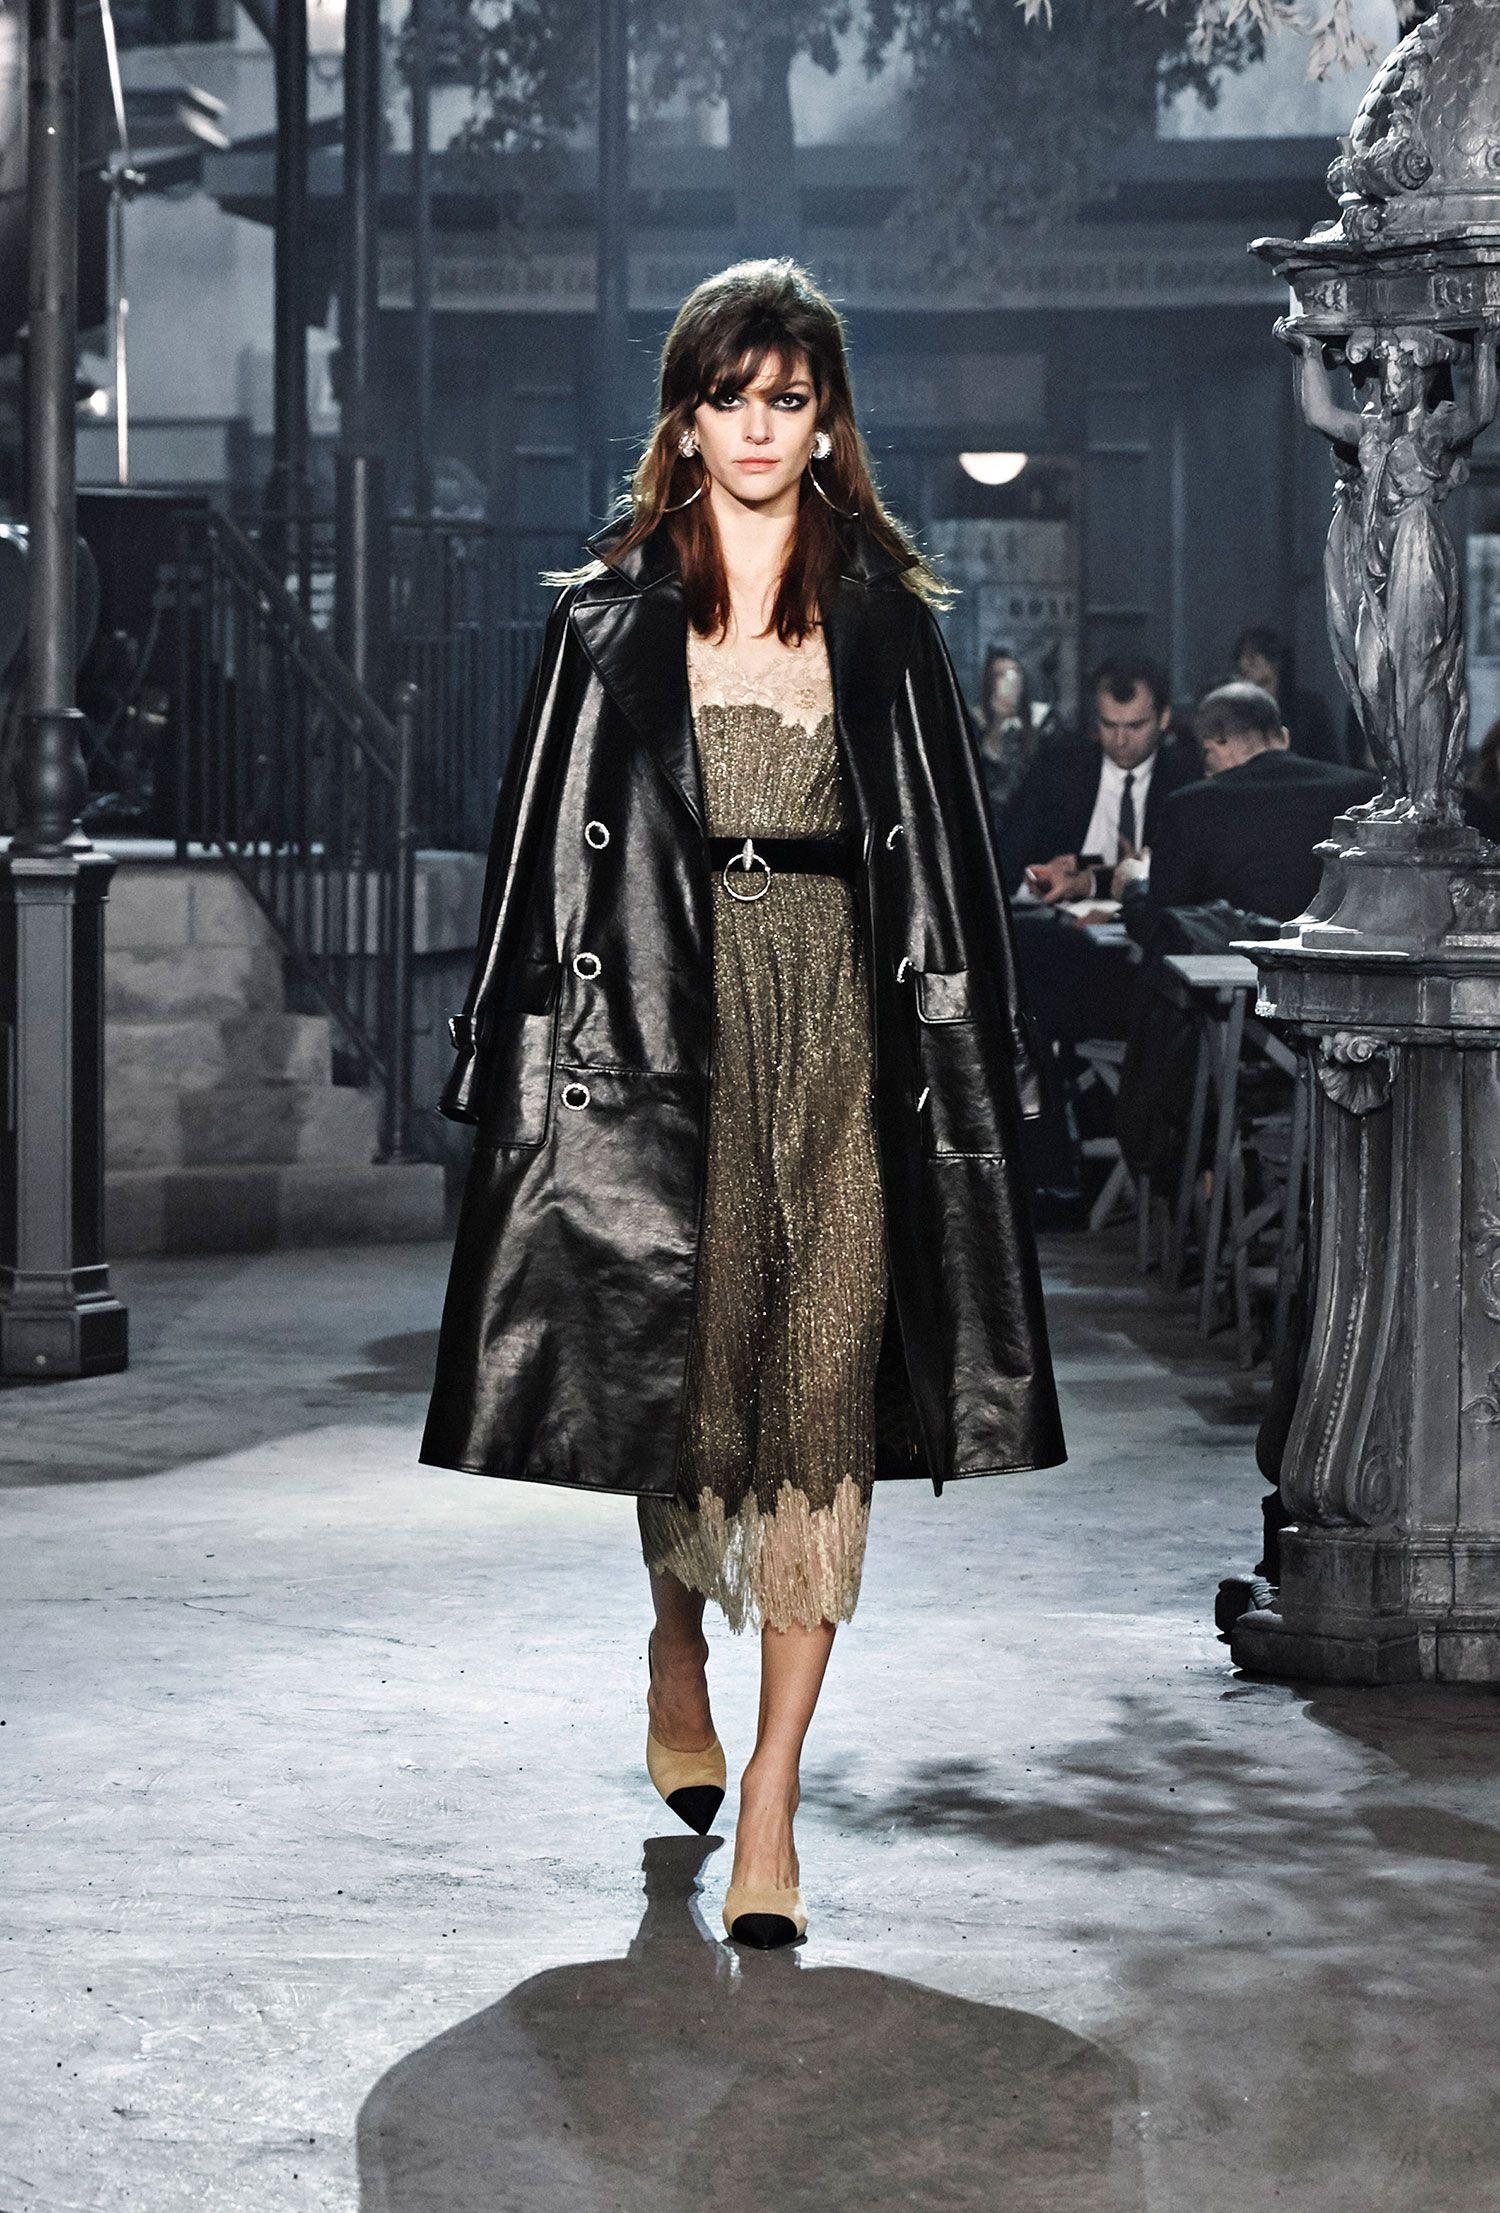 Chanel Karl Lagerfeld's film noir Fashion, Dress like a